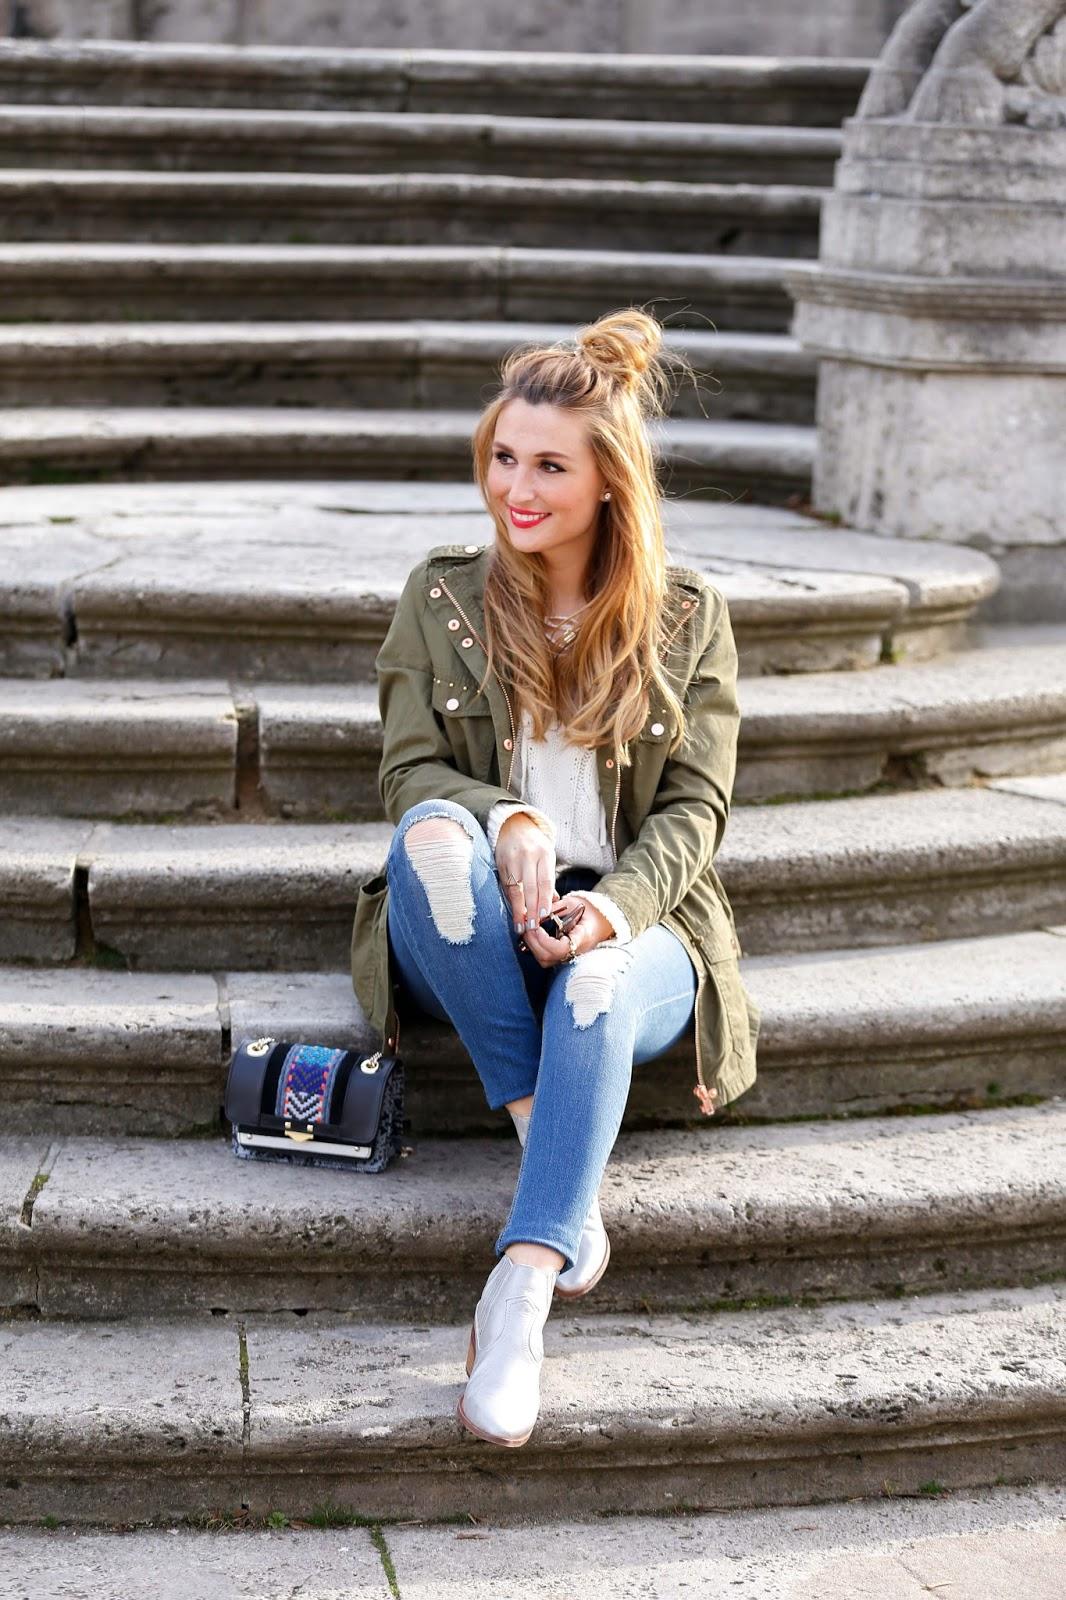 Blogger-style-fashionblogger-aus-deutschland-deutsche-fashionblogger-Fashionstylebyjohanna-blogger-aus-deutshland-blogger-aus-frankfurt-frankfurt-fashionblogger